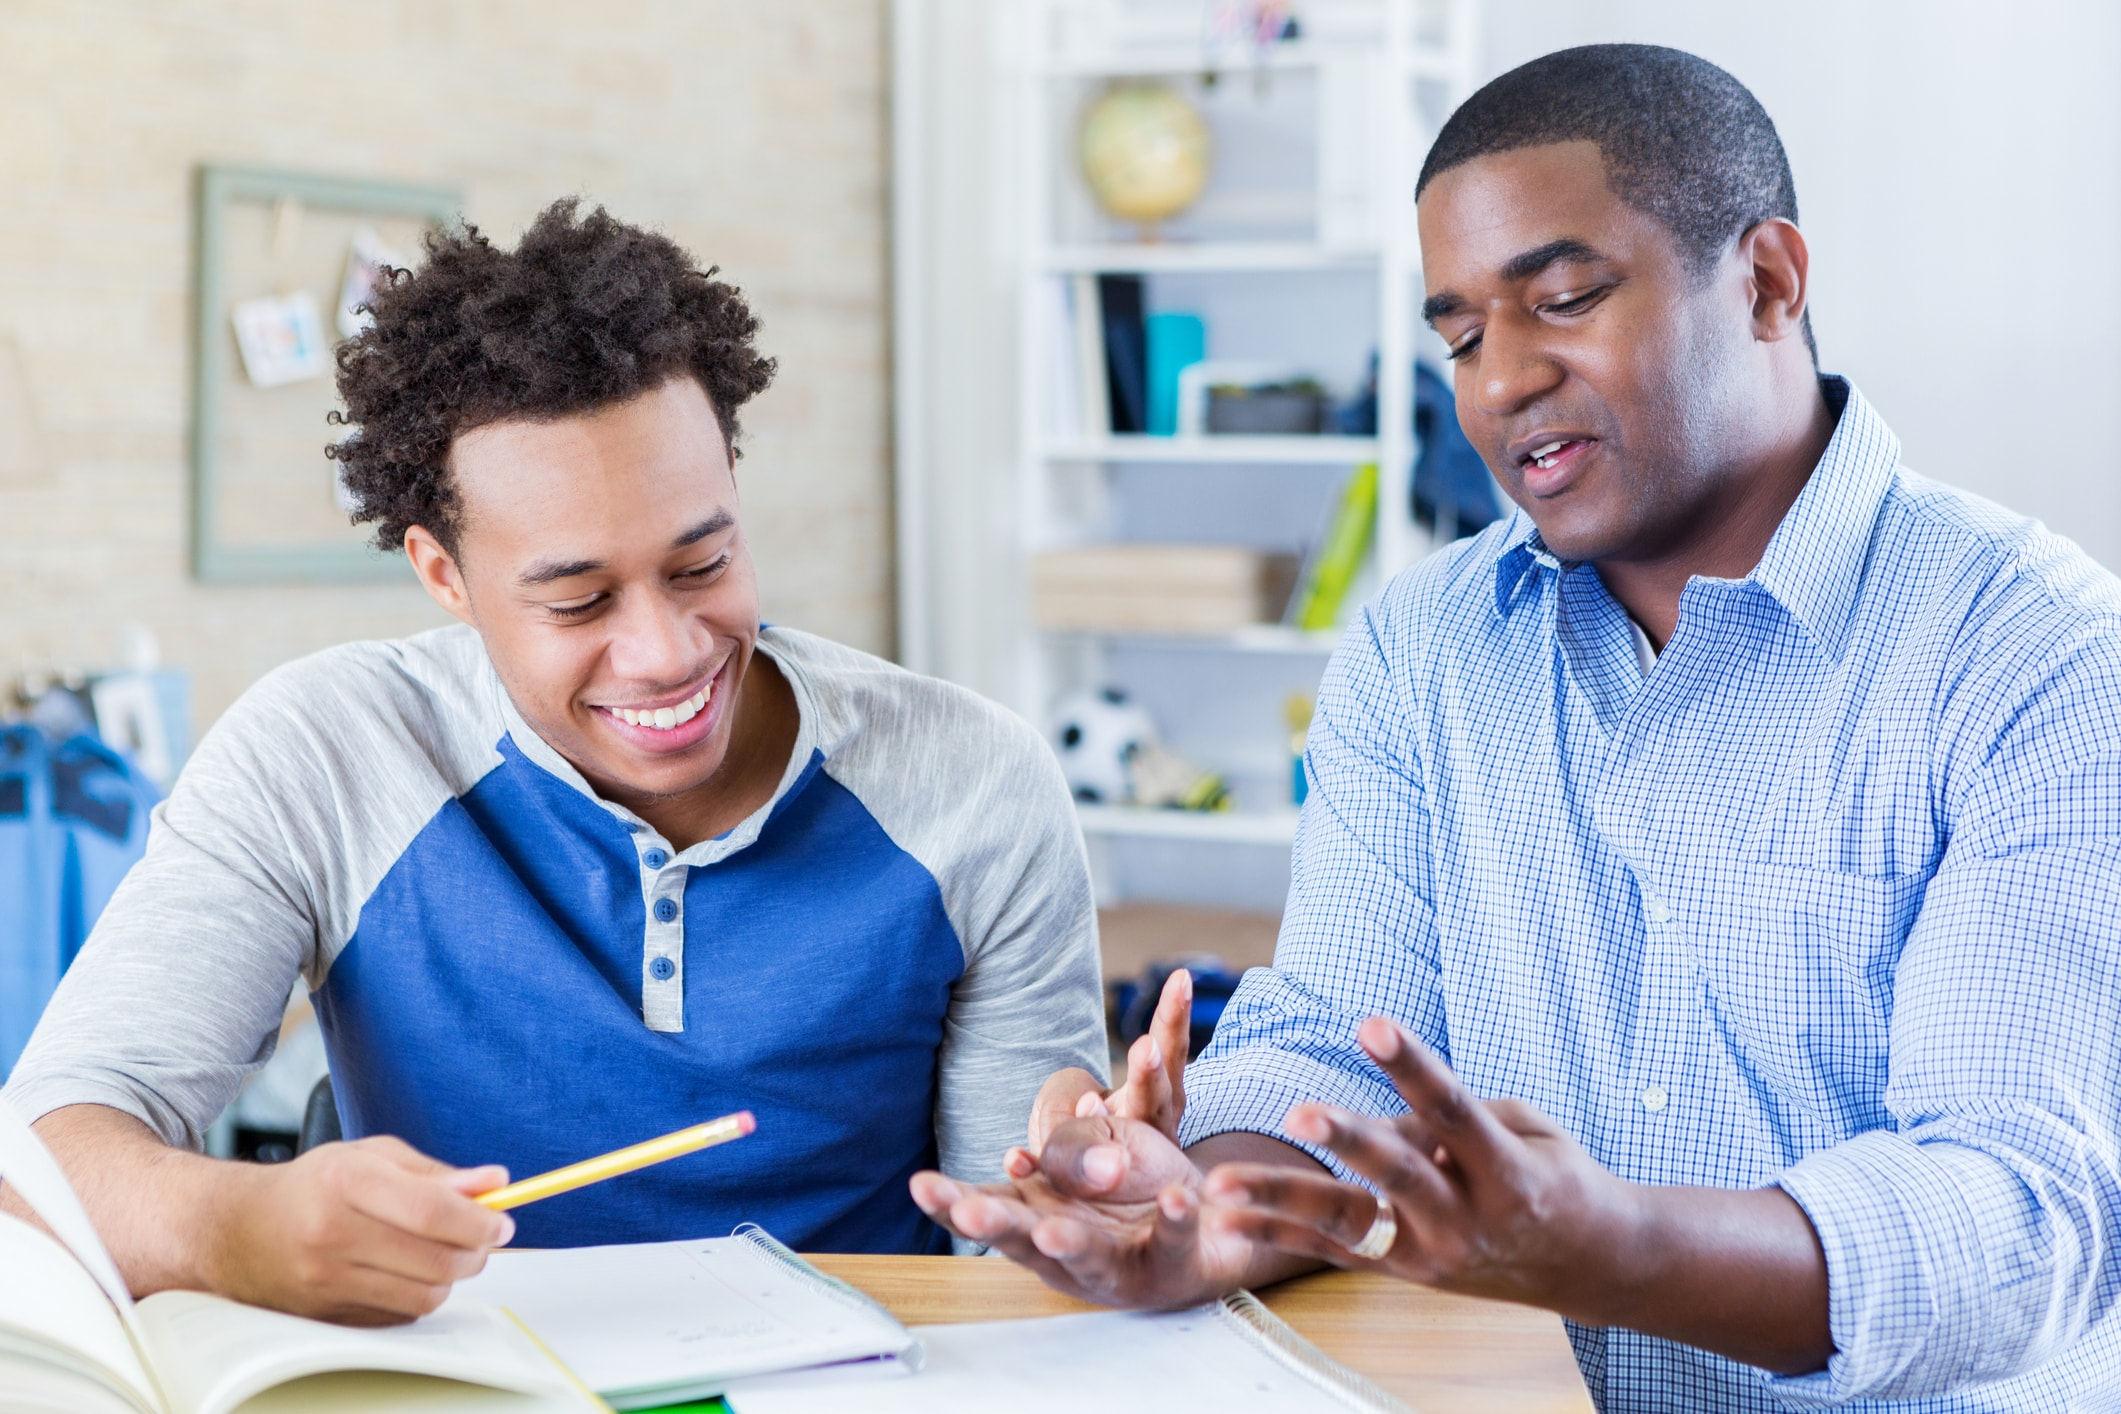 mentor-helping-with-homework.jpg